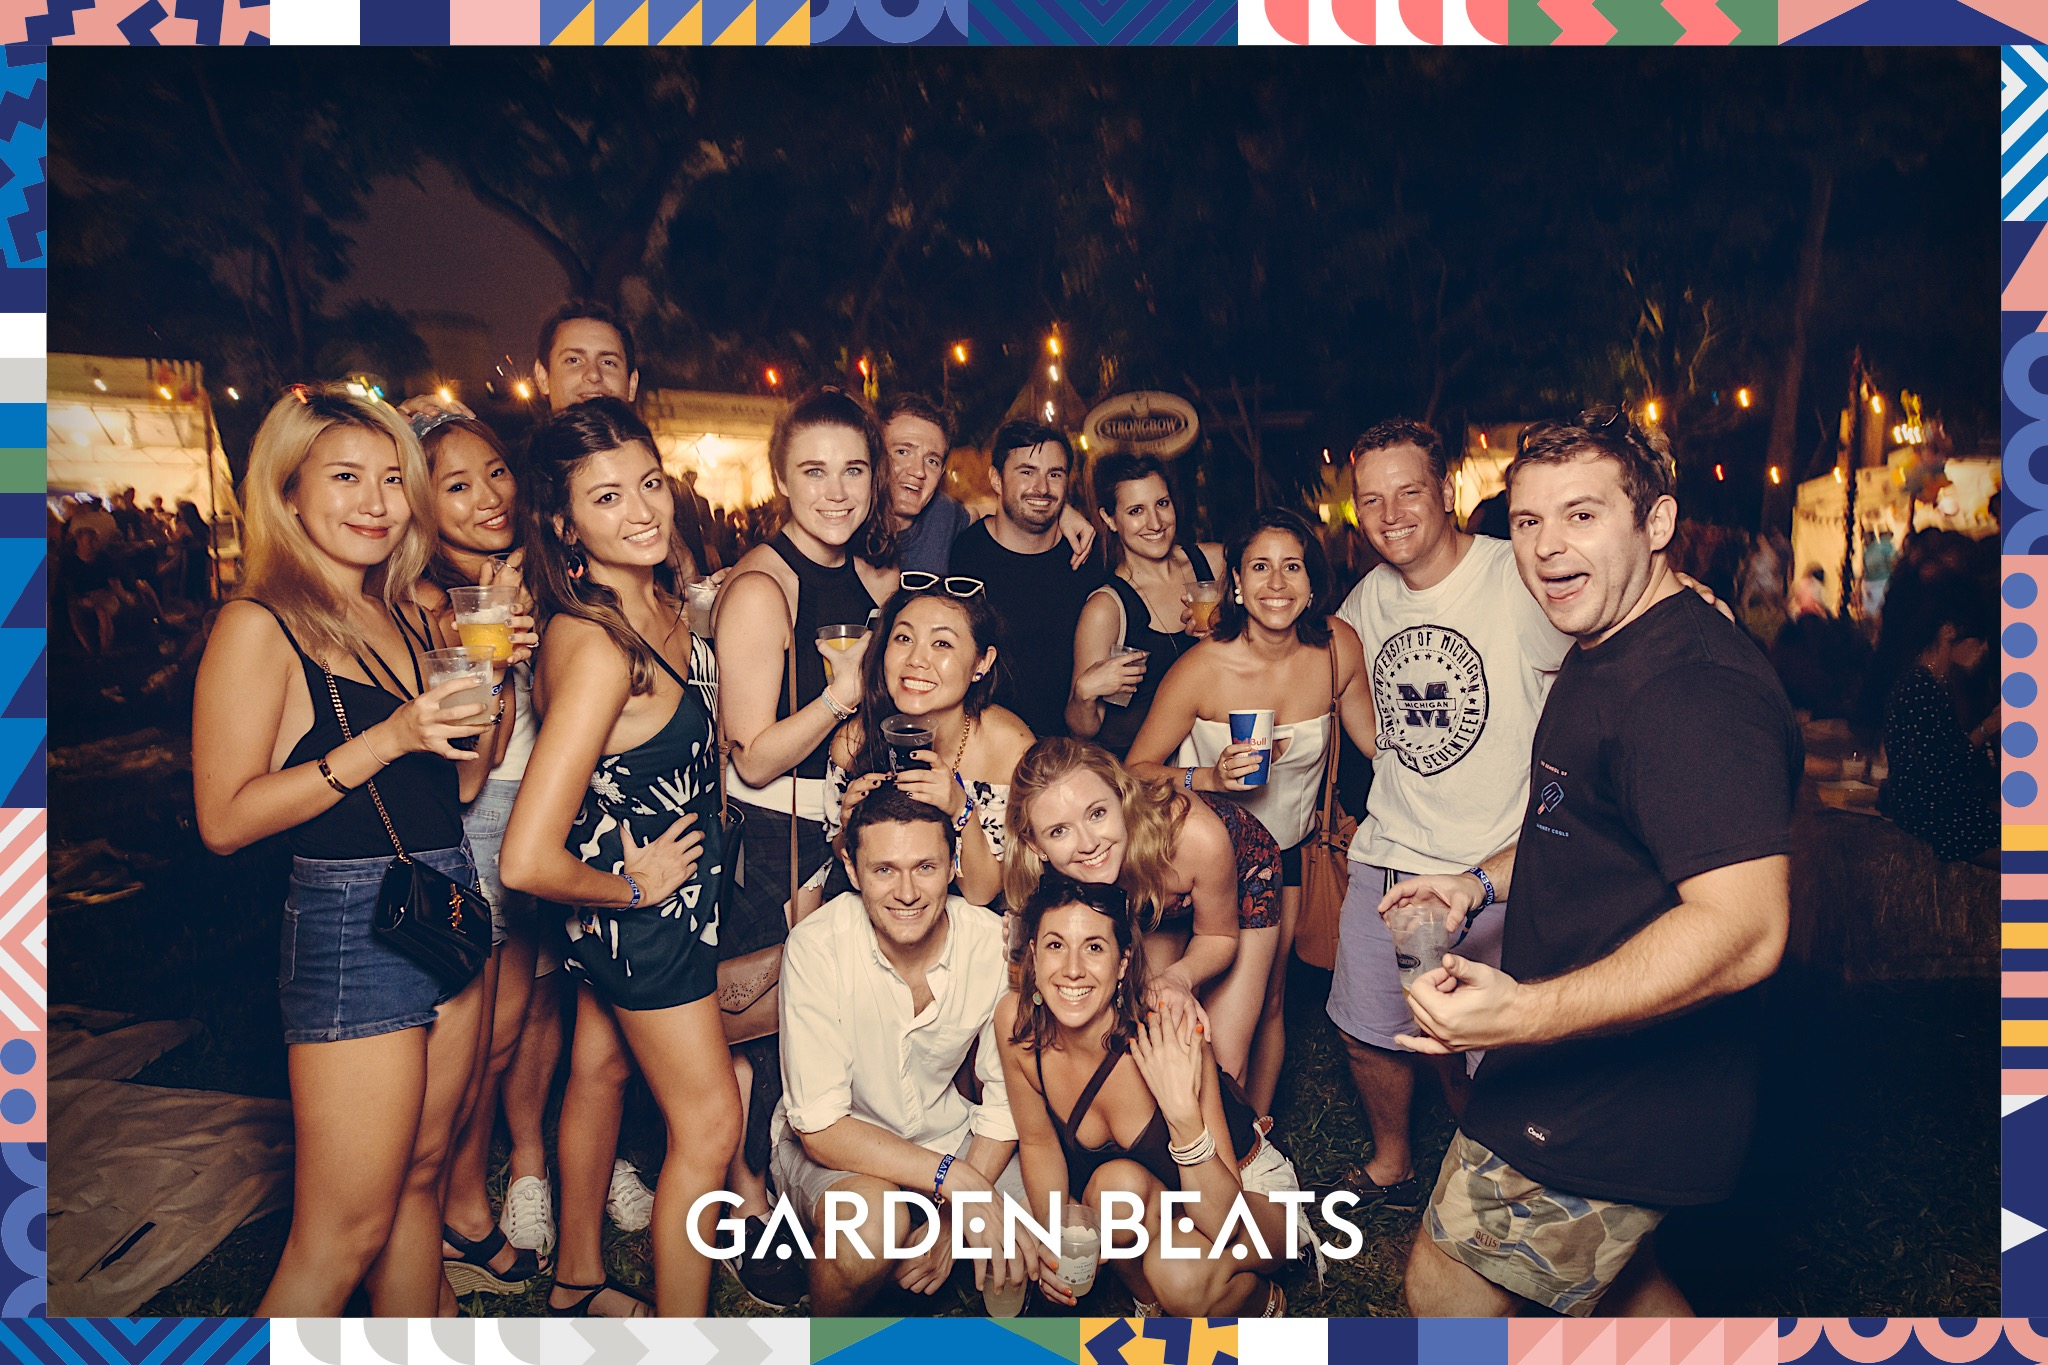 18032017_GardenBeats_Colossal846_WatermarkedGB.jpg